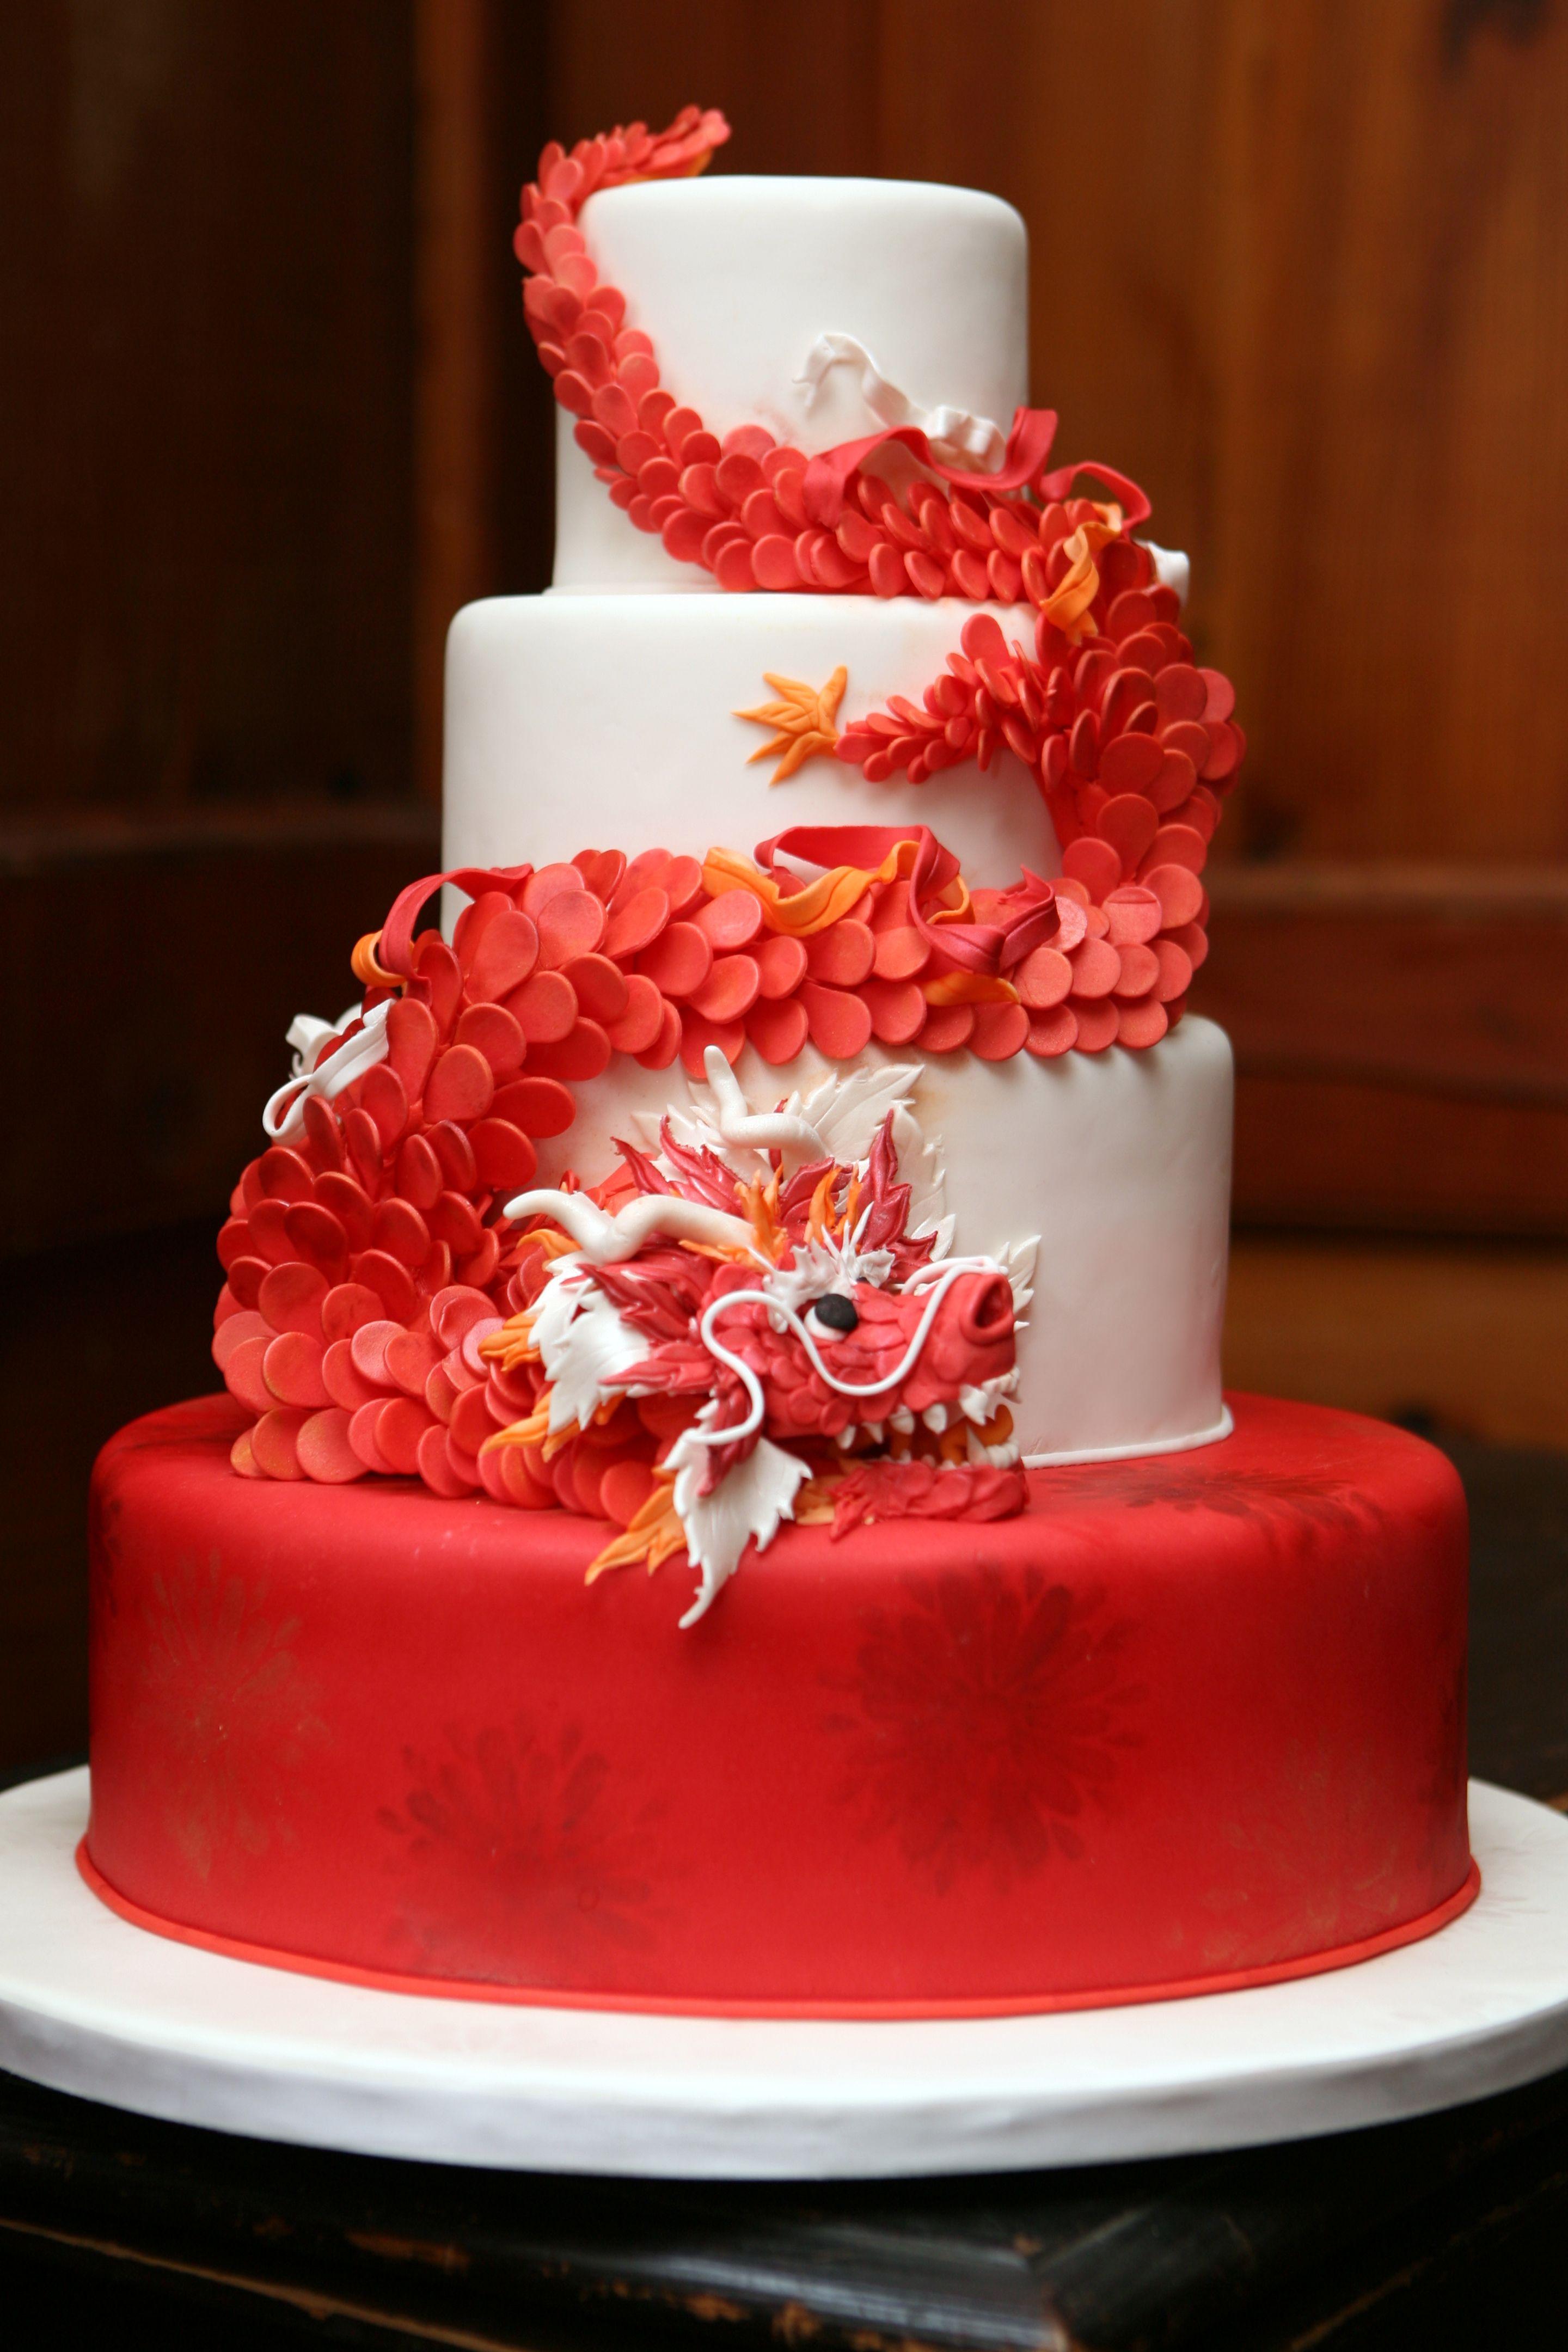 Creative Cake Designs That Will Make You Run To The Fridge